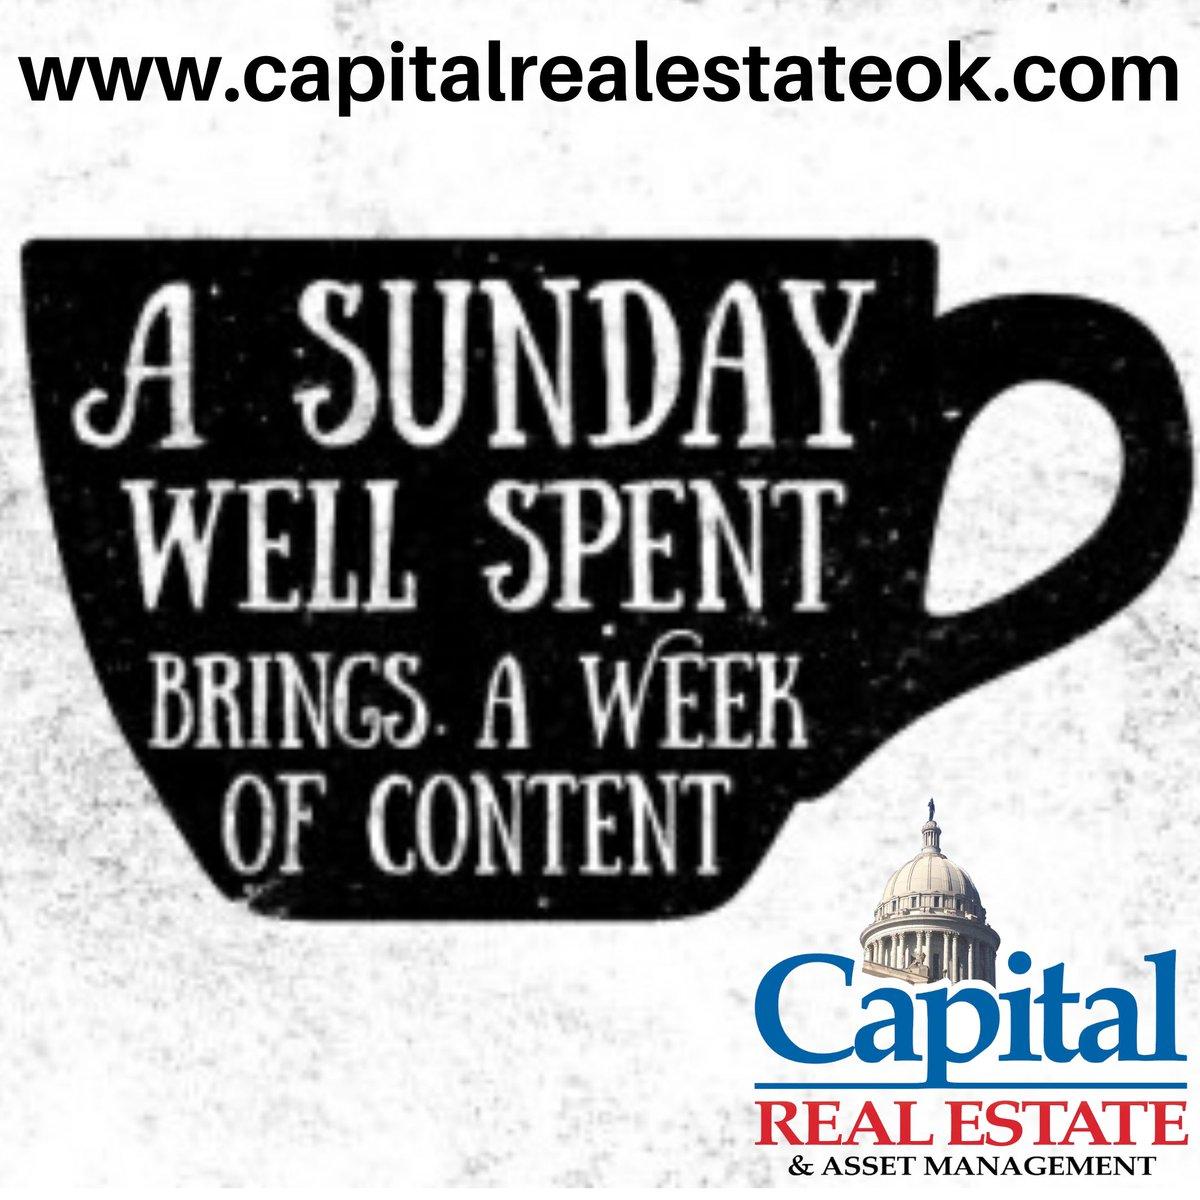 Enjoy your Sunday, even though it's wet and cold outside we hope everyone enjoys their day. #SundayFunday #sundayvibes #FamilyTime #HomeSweetHome #CapitalRealEstate #Oklahoma #Realtors #Sundays  http://buff.ly/2HBBJNjpic.twitter.com/Rq9jk1hP2r